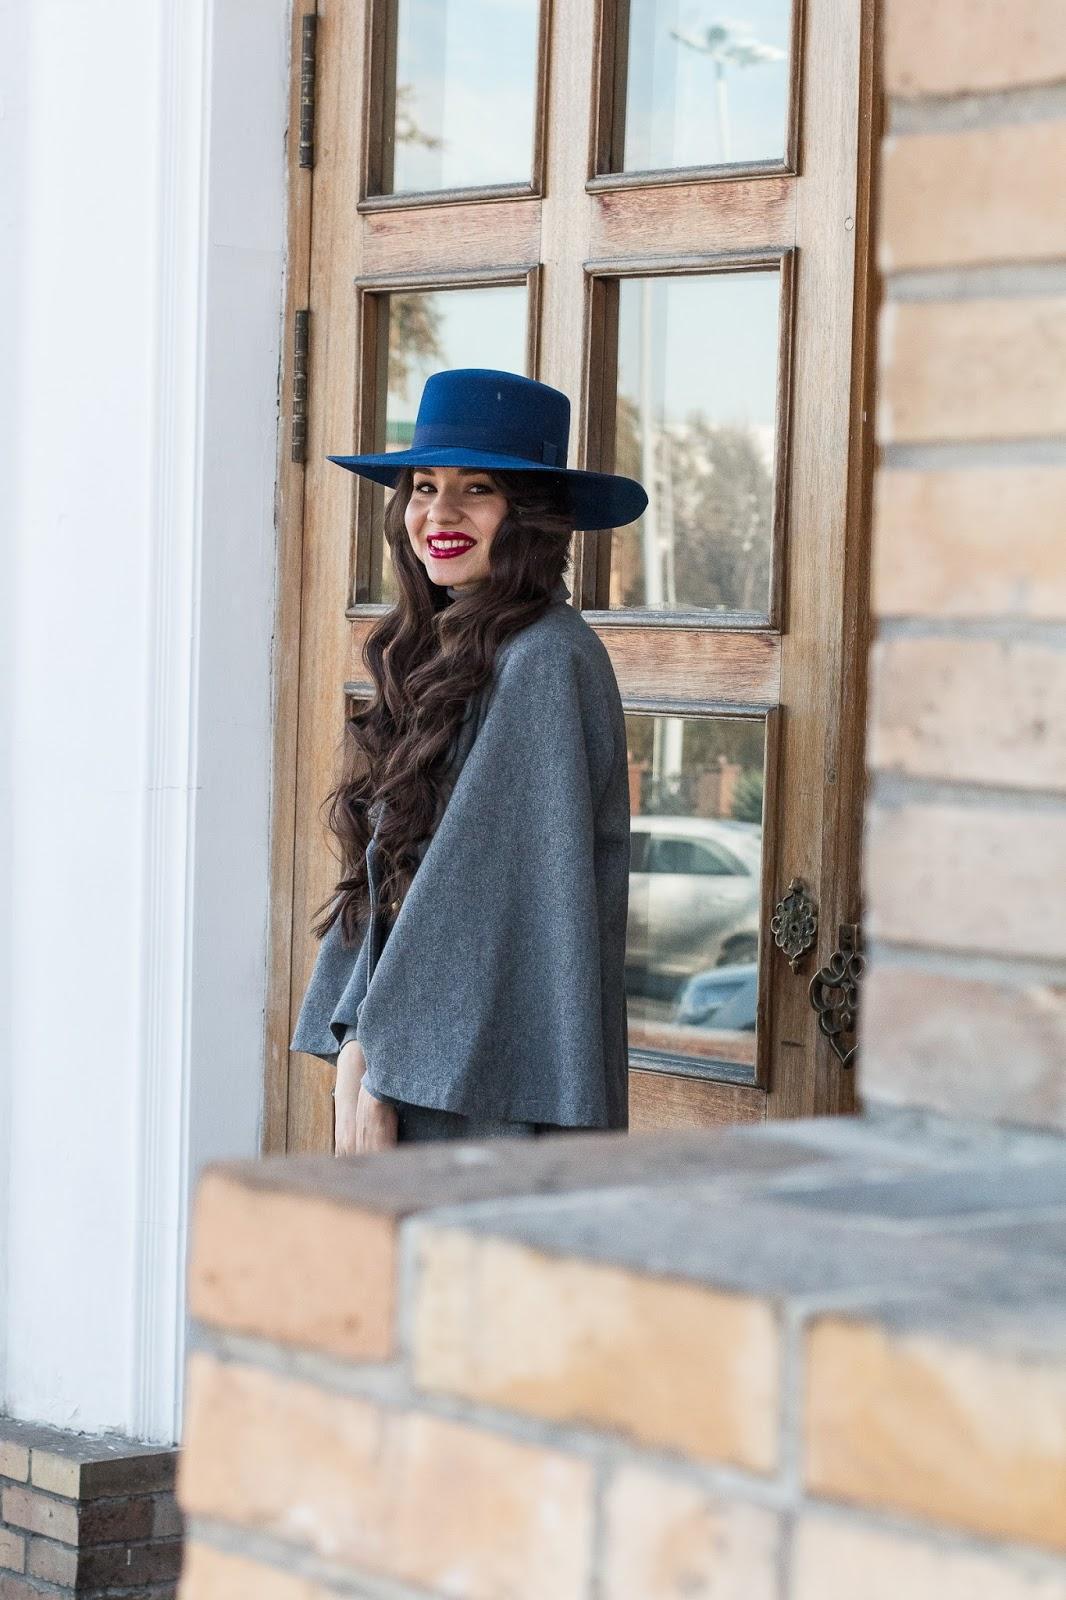 fashion blogger diyorasnotes diyora beta oversized hat asos polka dot skirt outfit of the day blue hat grey coat vipme